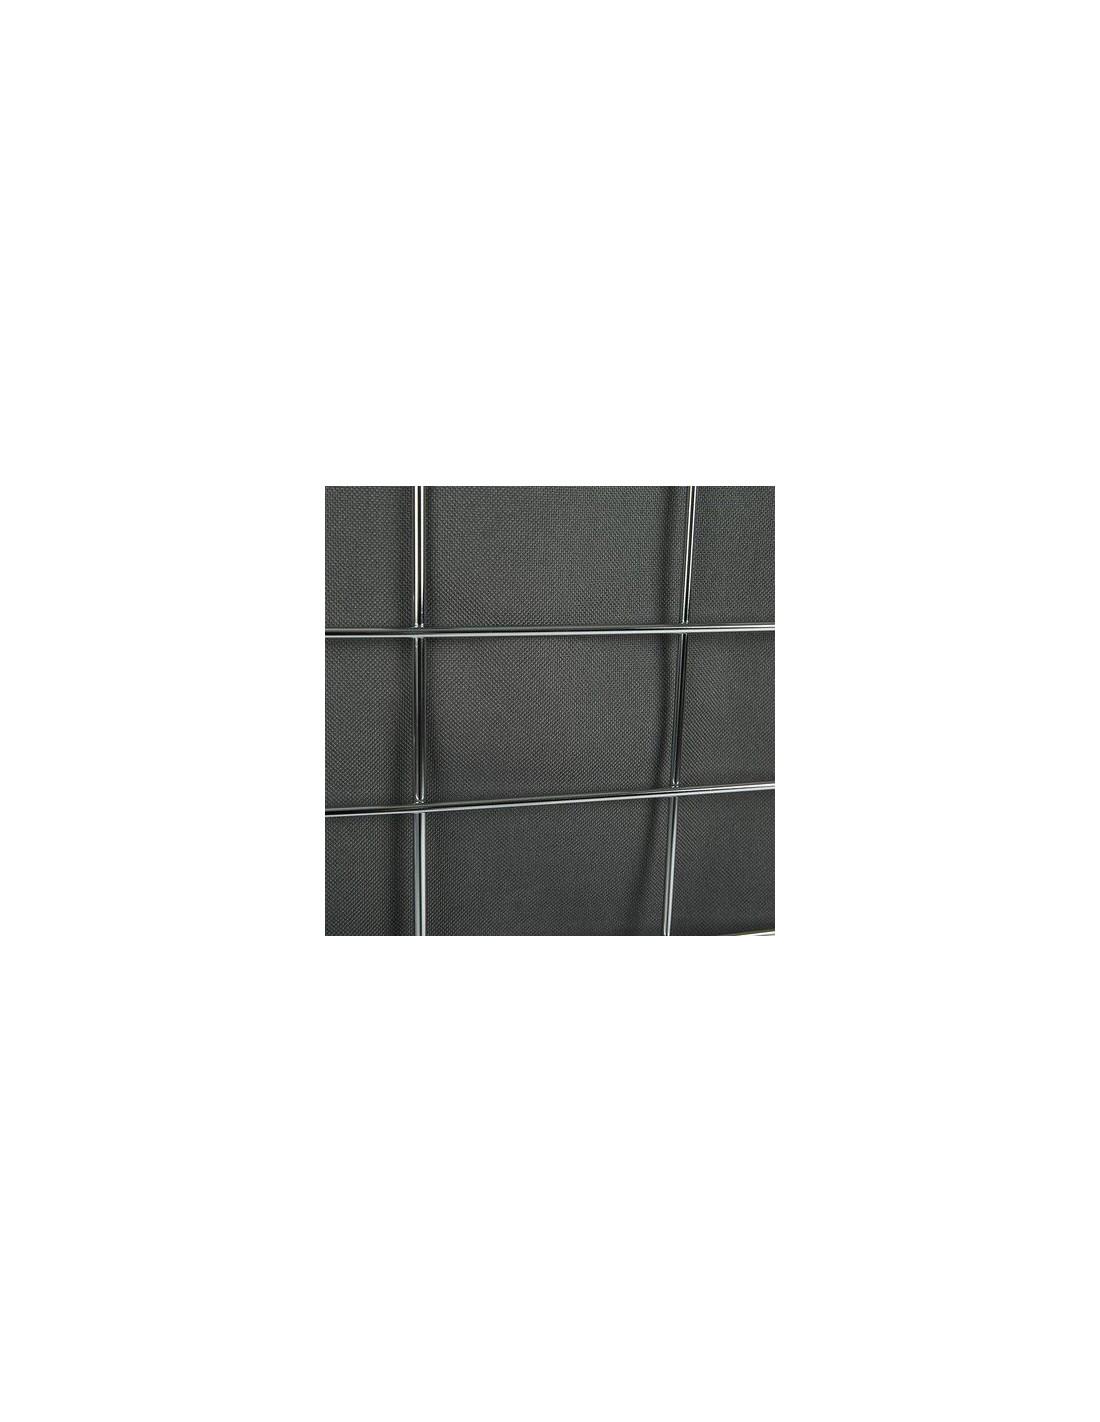 panier linge nsfp nylon gris de decor walther. Black Bedroom Furniture Sets. Home Design Ideas